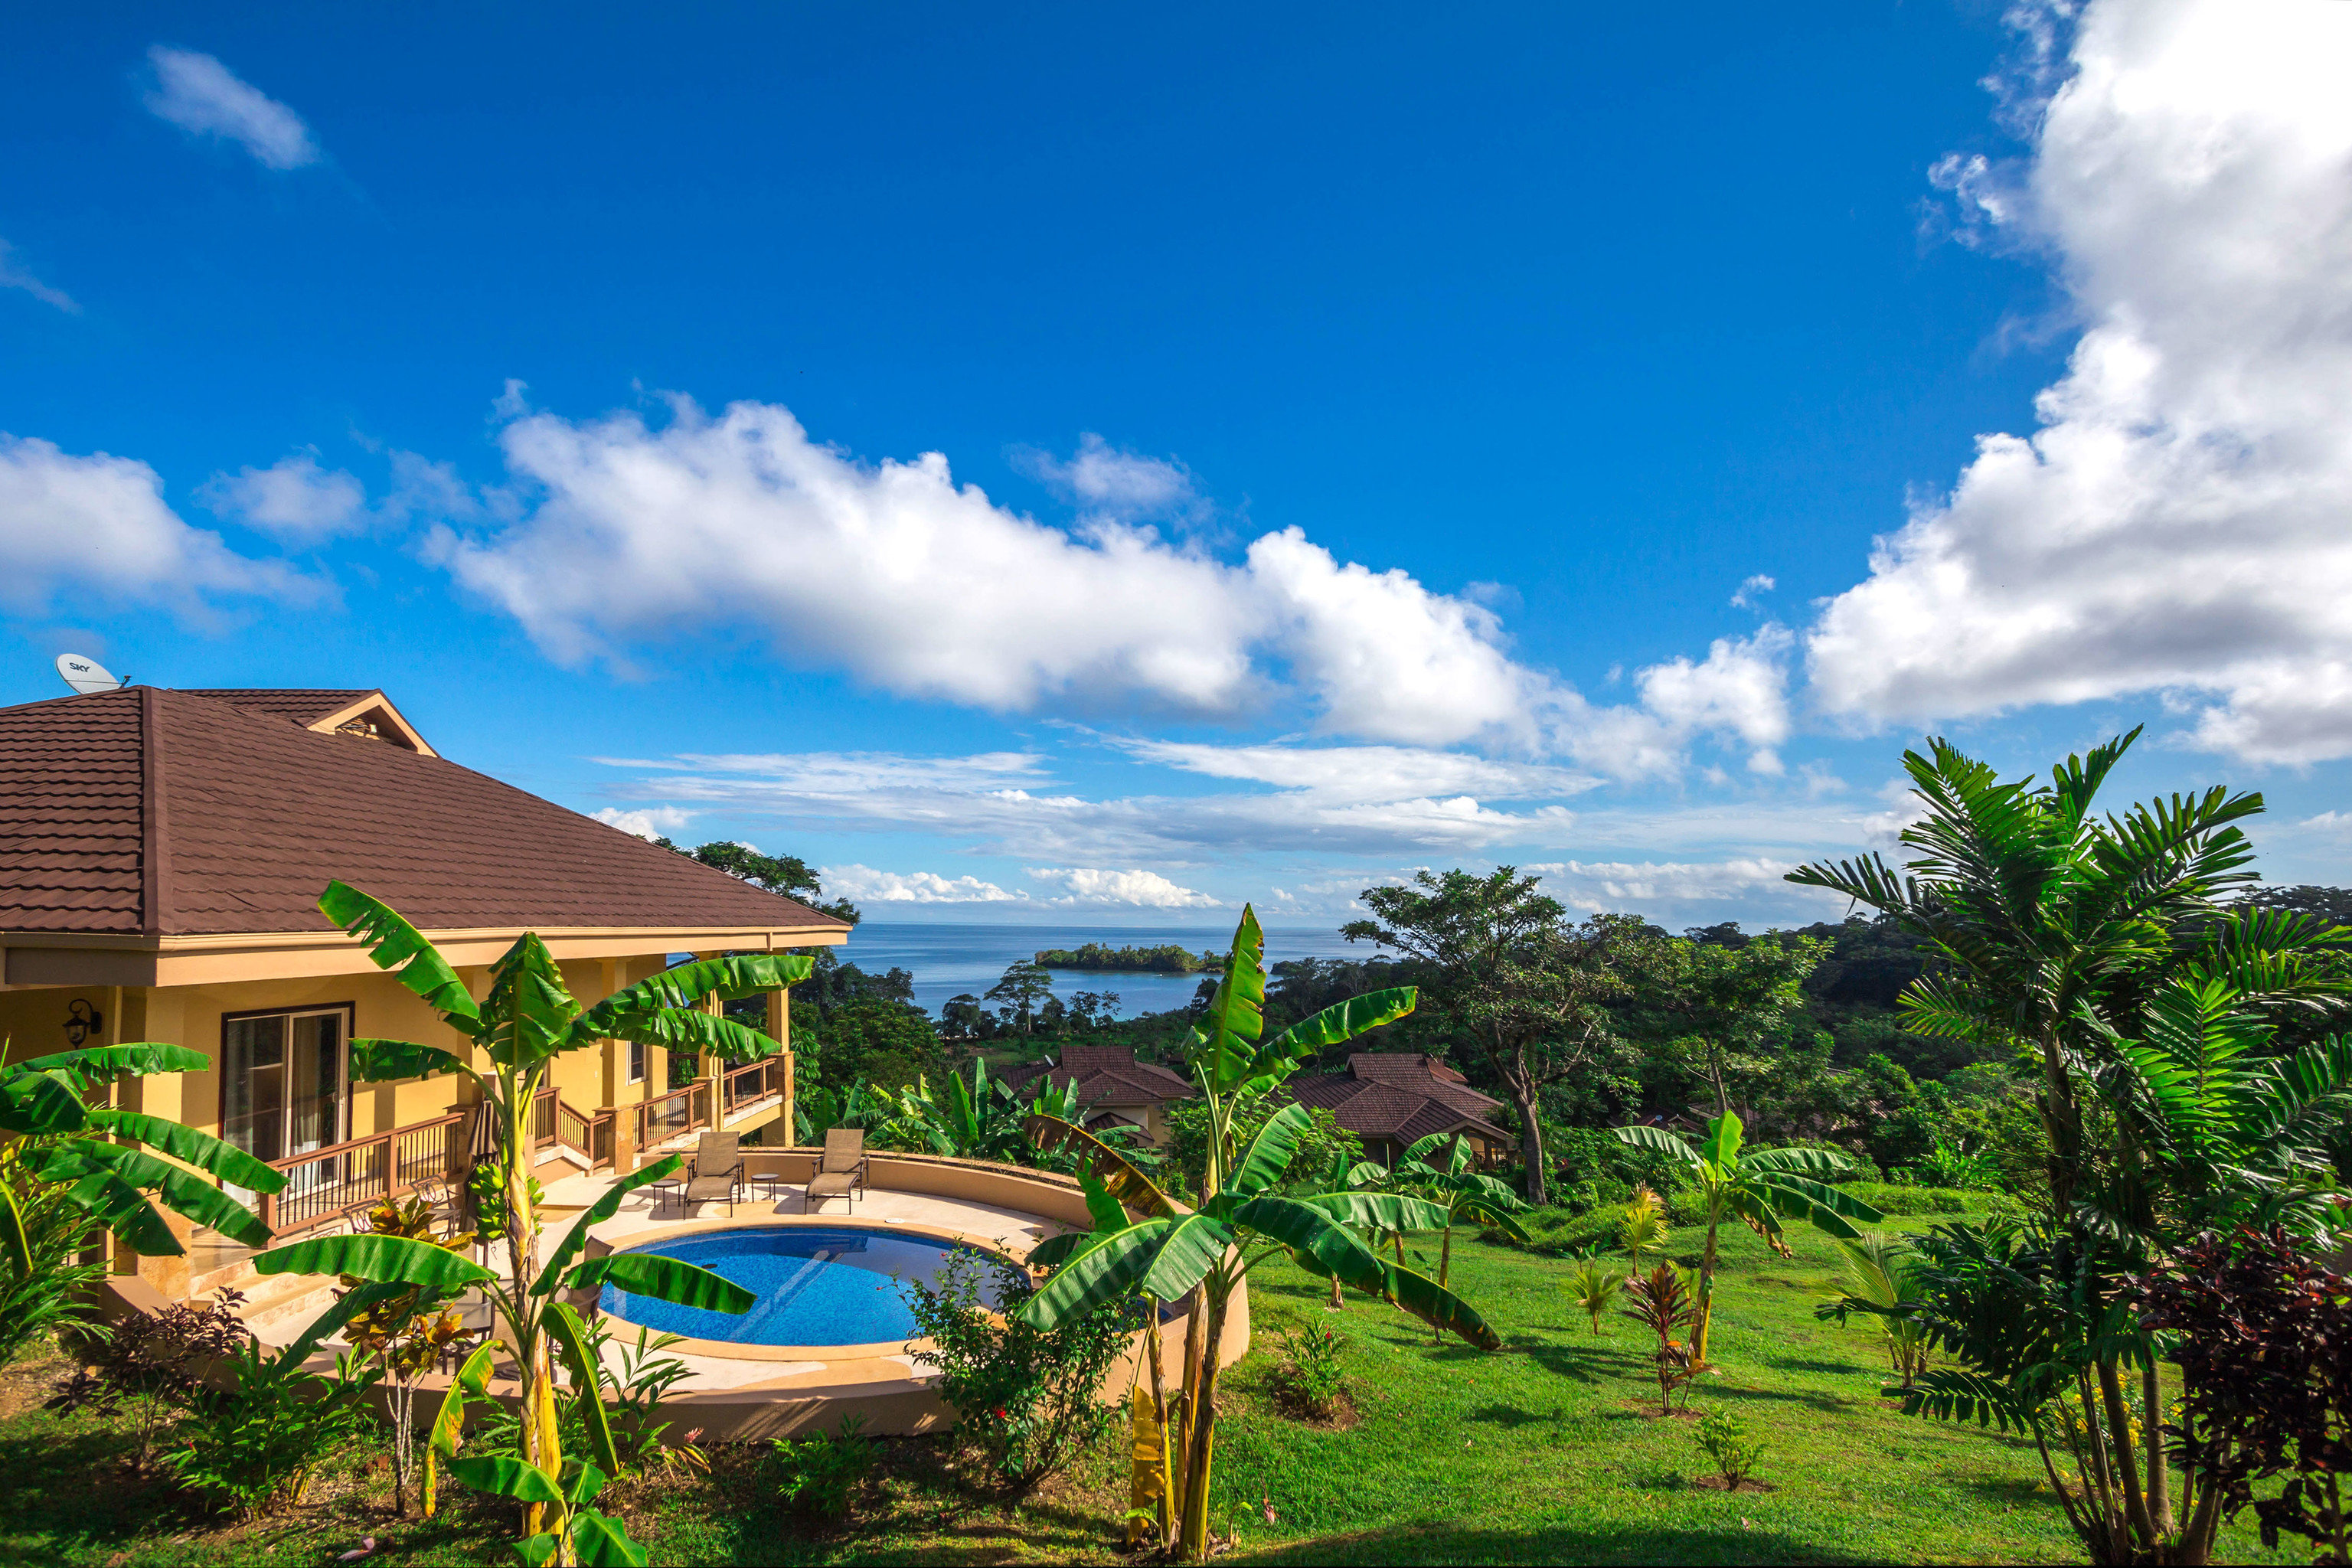 sky grass Resort caribbean Beach swimming pool Sea arecales tropics lush day